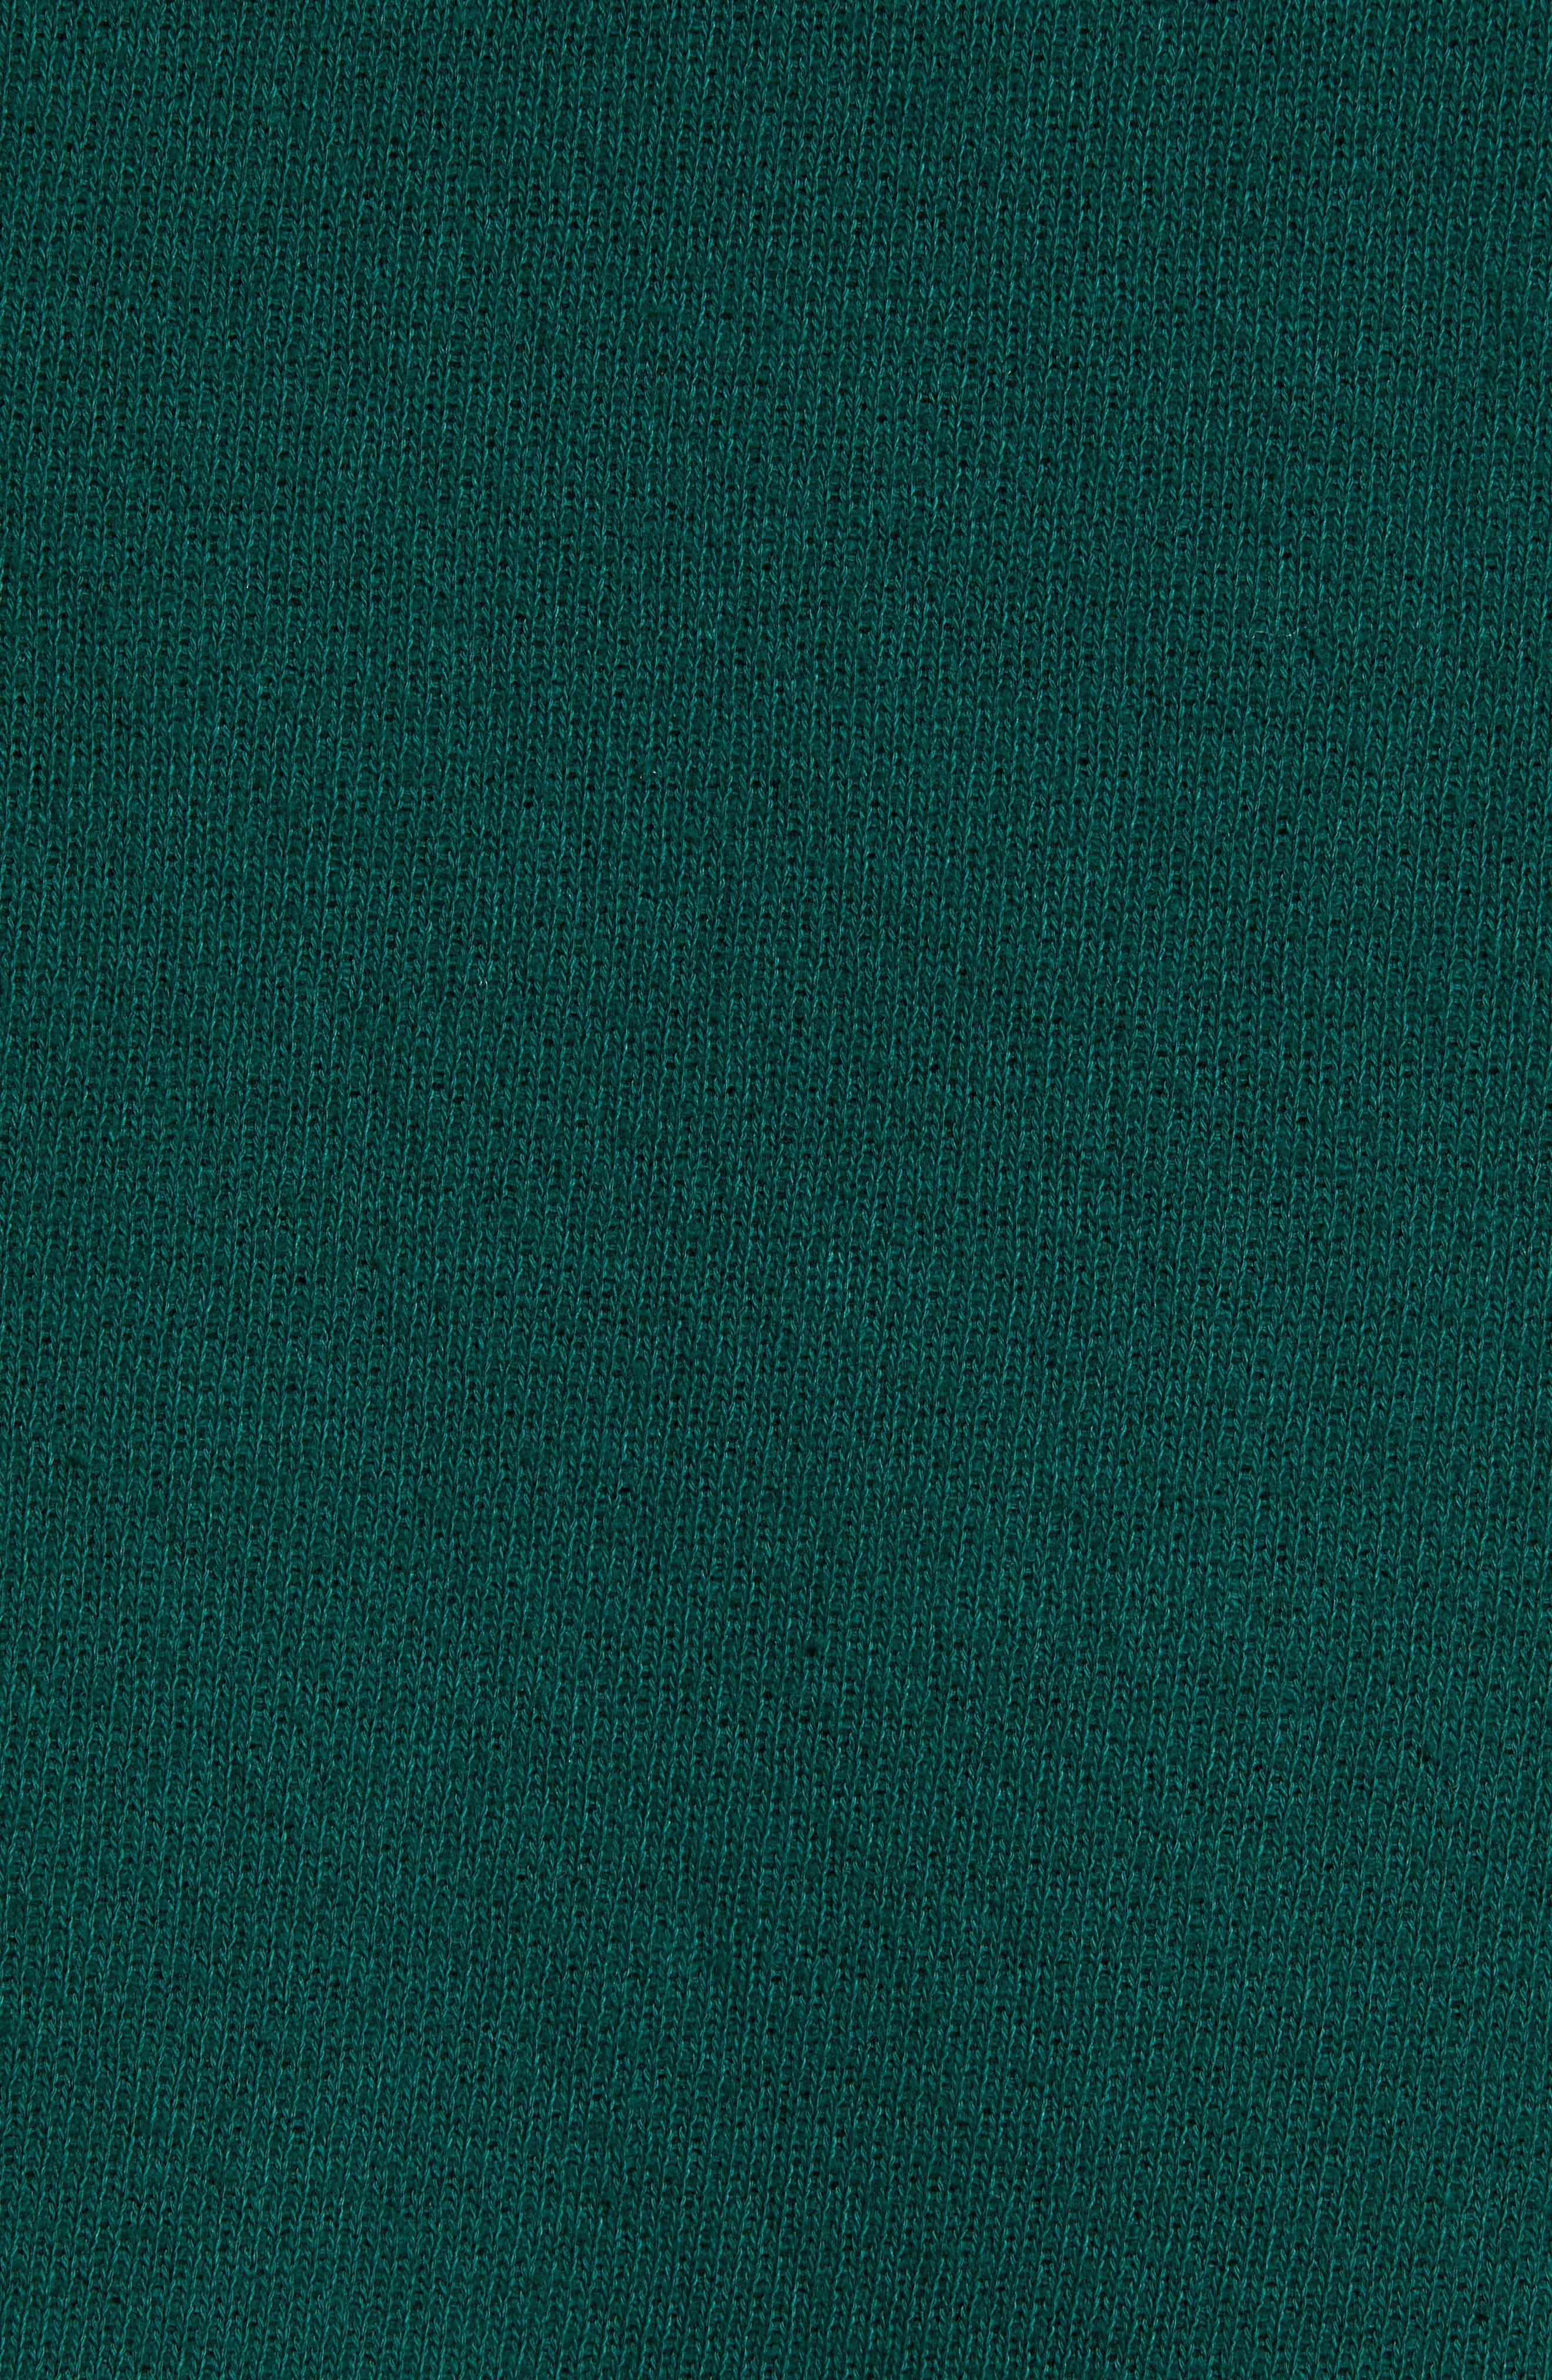 Warwick Quarter-Zip Hoodie Sweatshirt,                             Alternate thumbnail 5, color,                             HUNTER GREEN